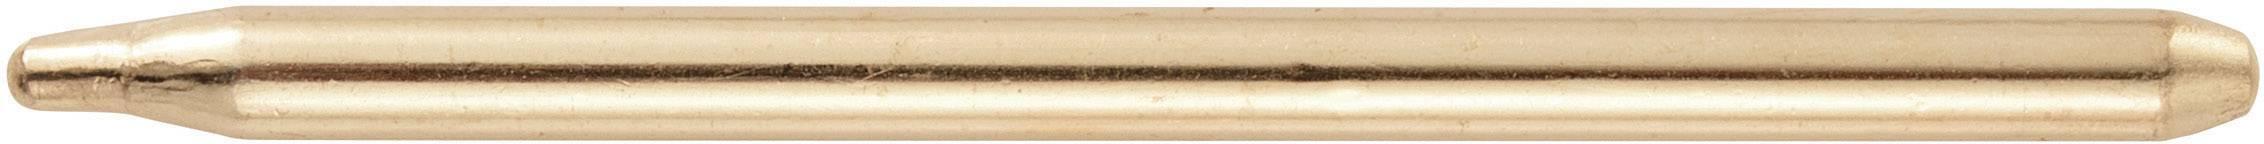 Teplovodná rúrka Gelid CP-S6100-01, (Ø x d) 6 mm x 100 mm, meď, voda